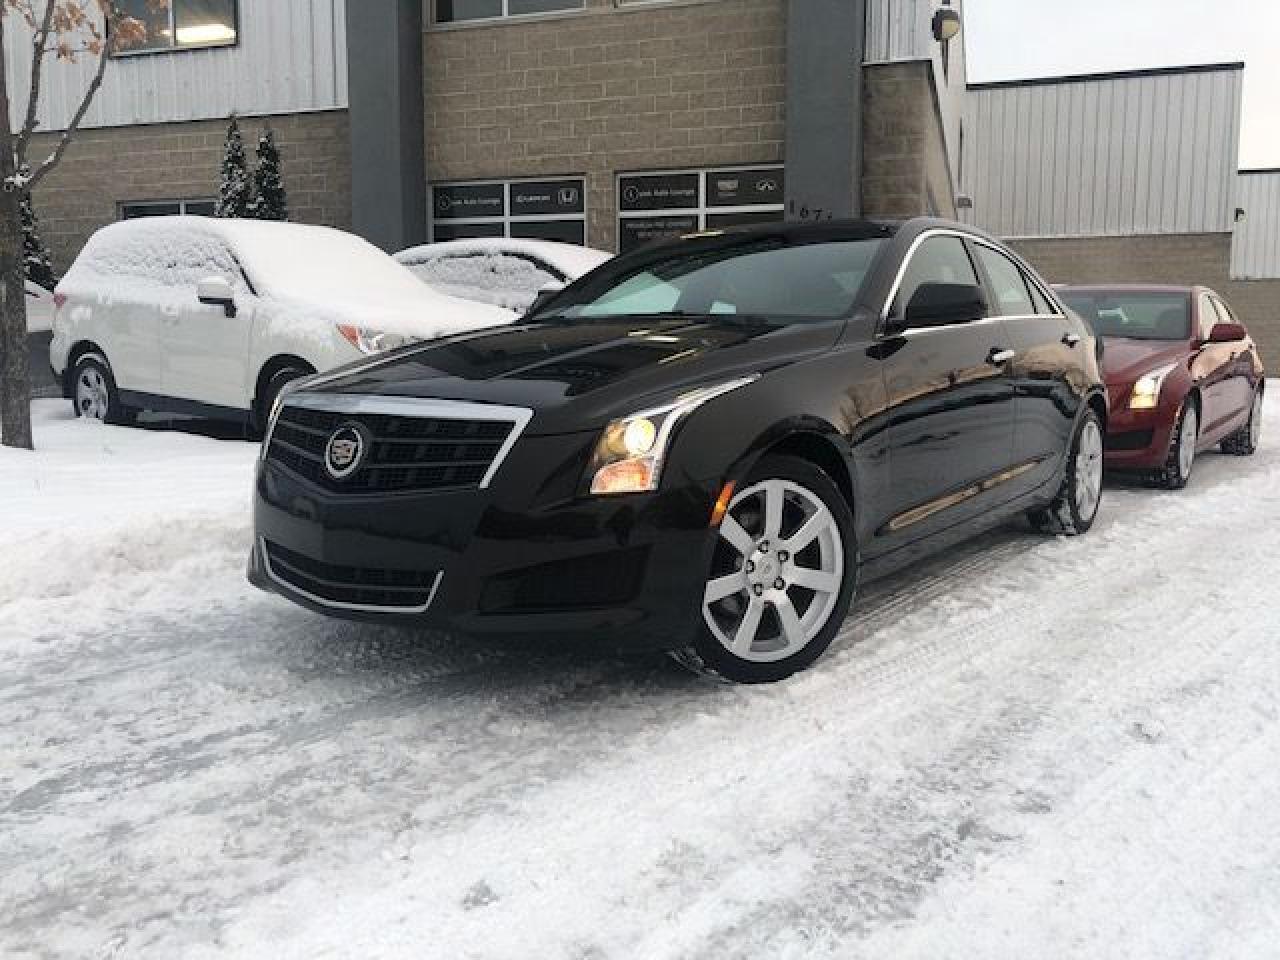 2014 Cadillac ATS AUTO, SUNROOF, BOSE AUDIO, BALANCE OF GM WARRANTY